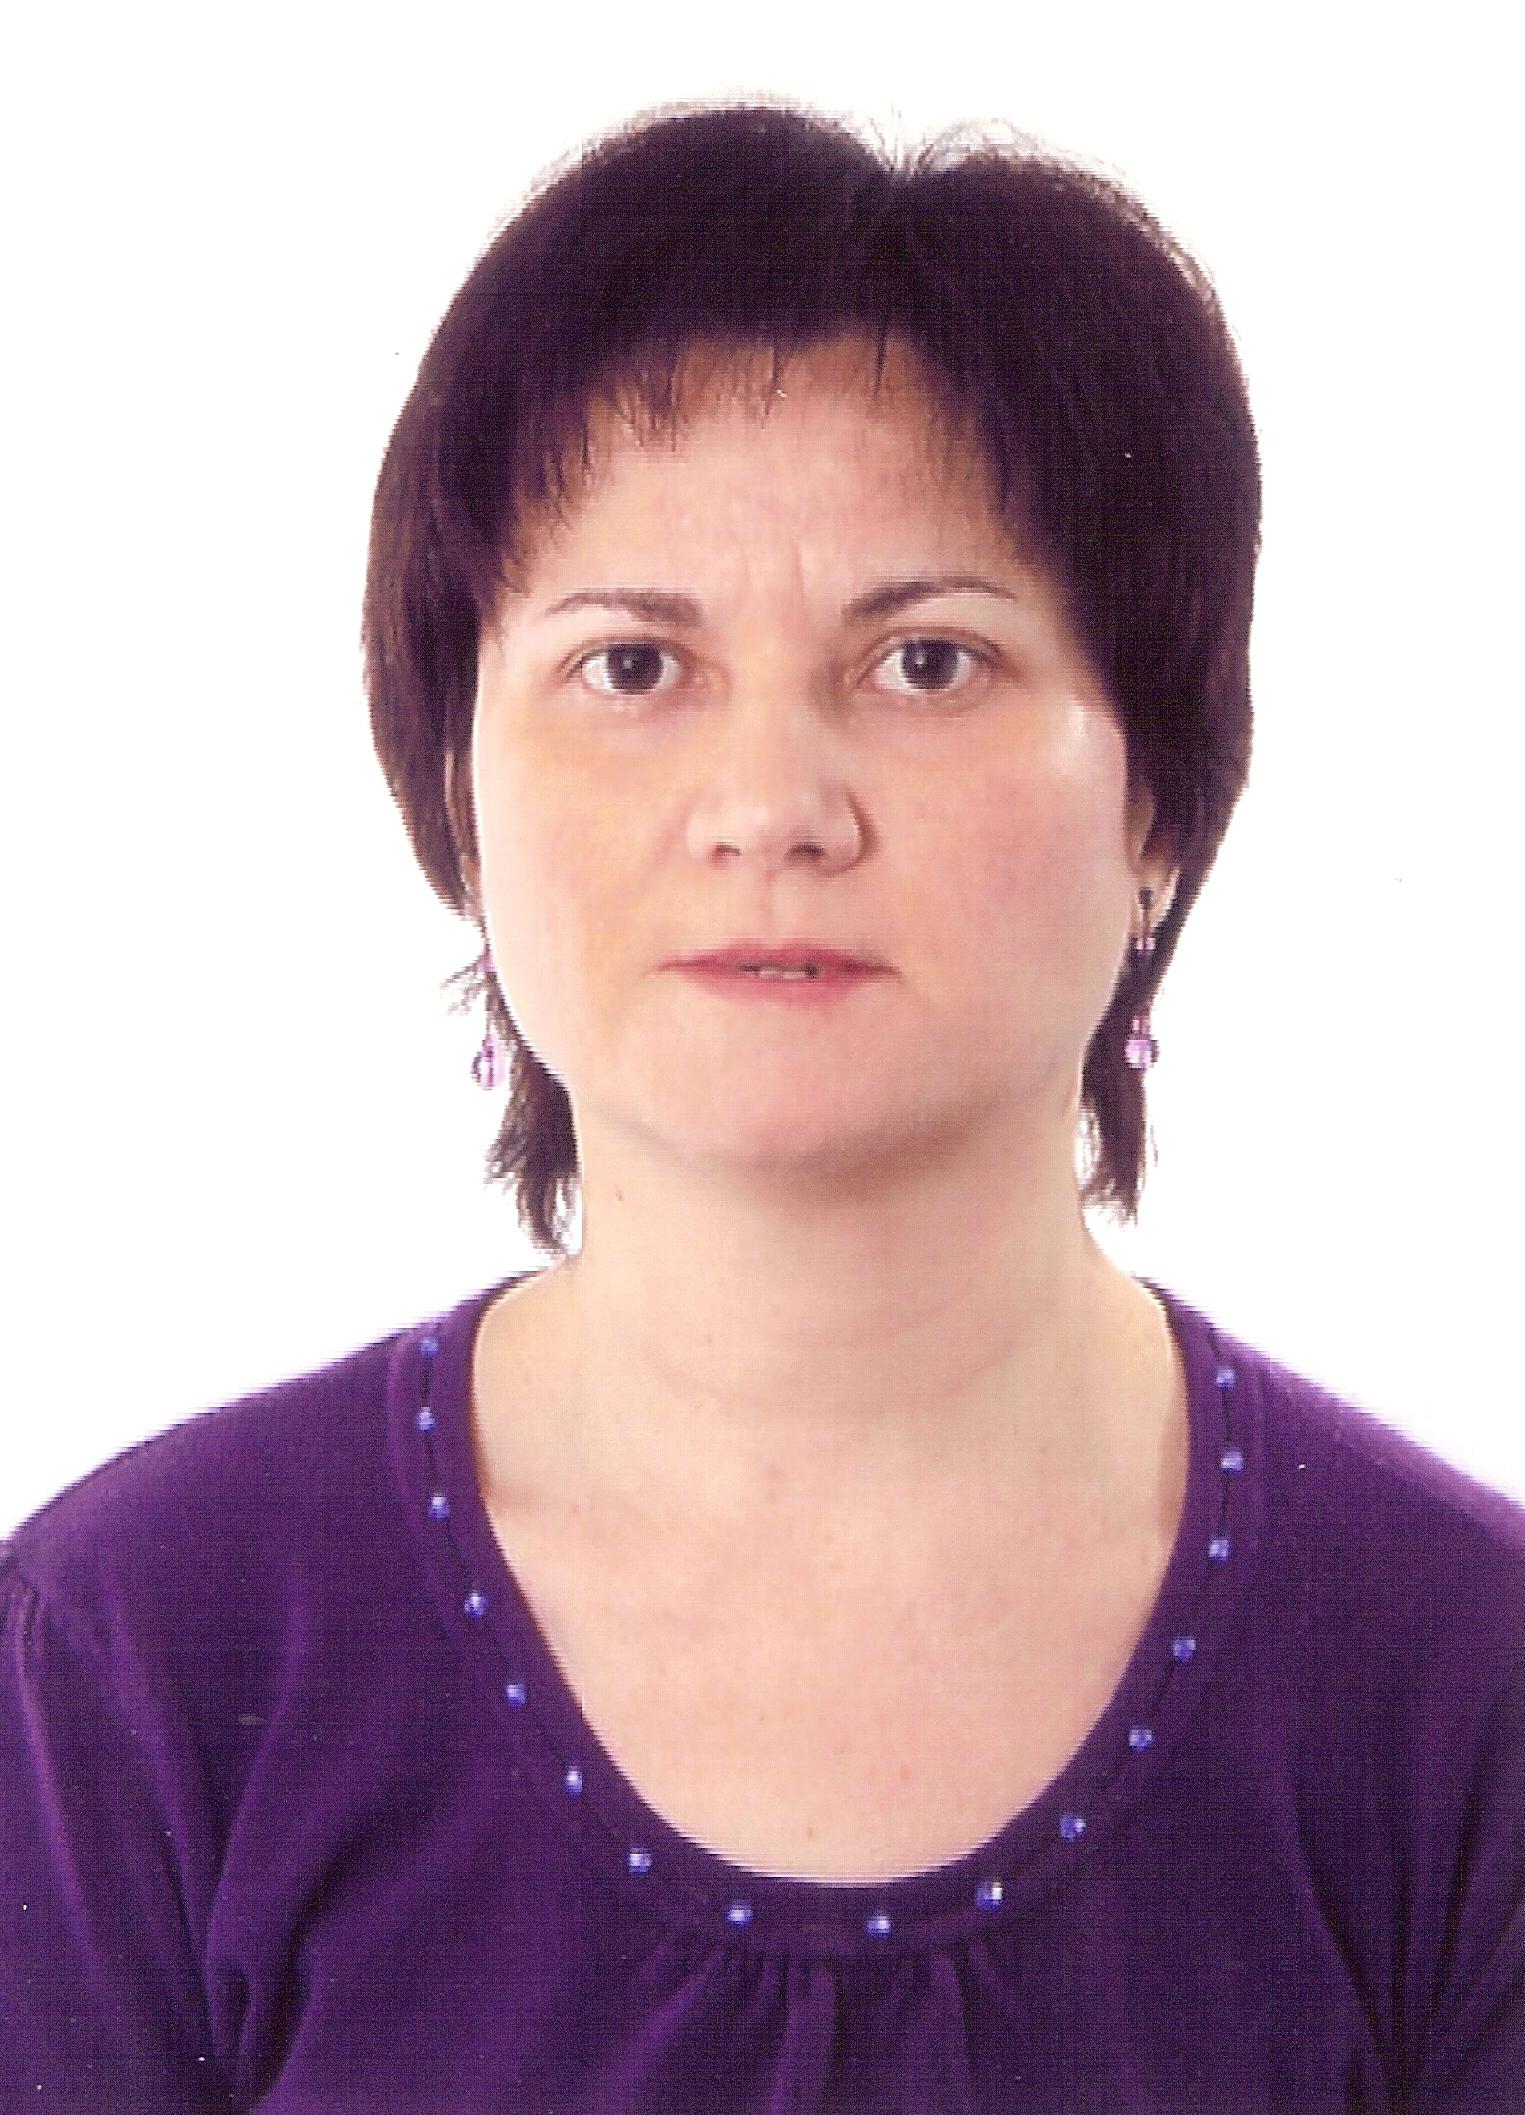 M. Isabel Aguilar